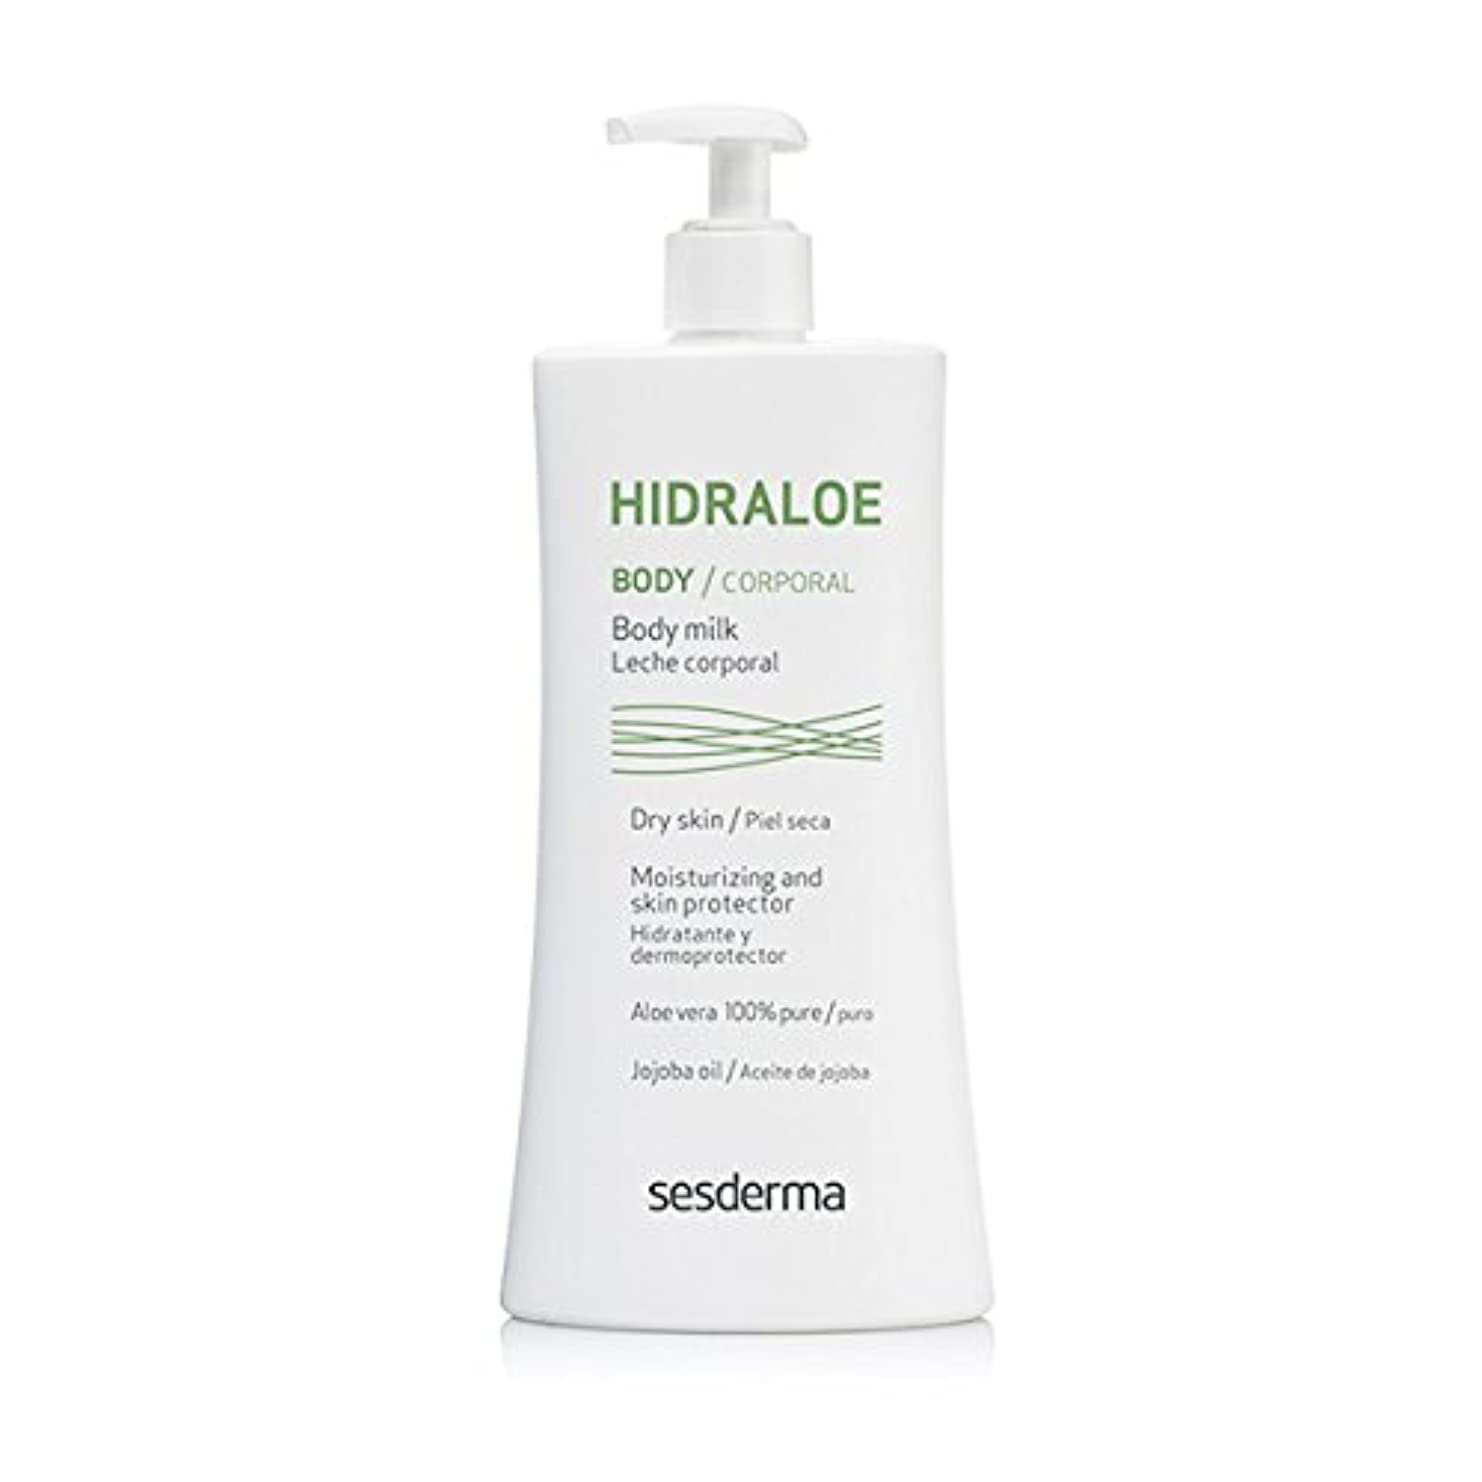 Sesderma Hidraloe Body Milk 400 Ml [並行輸入品]